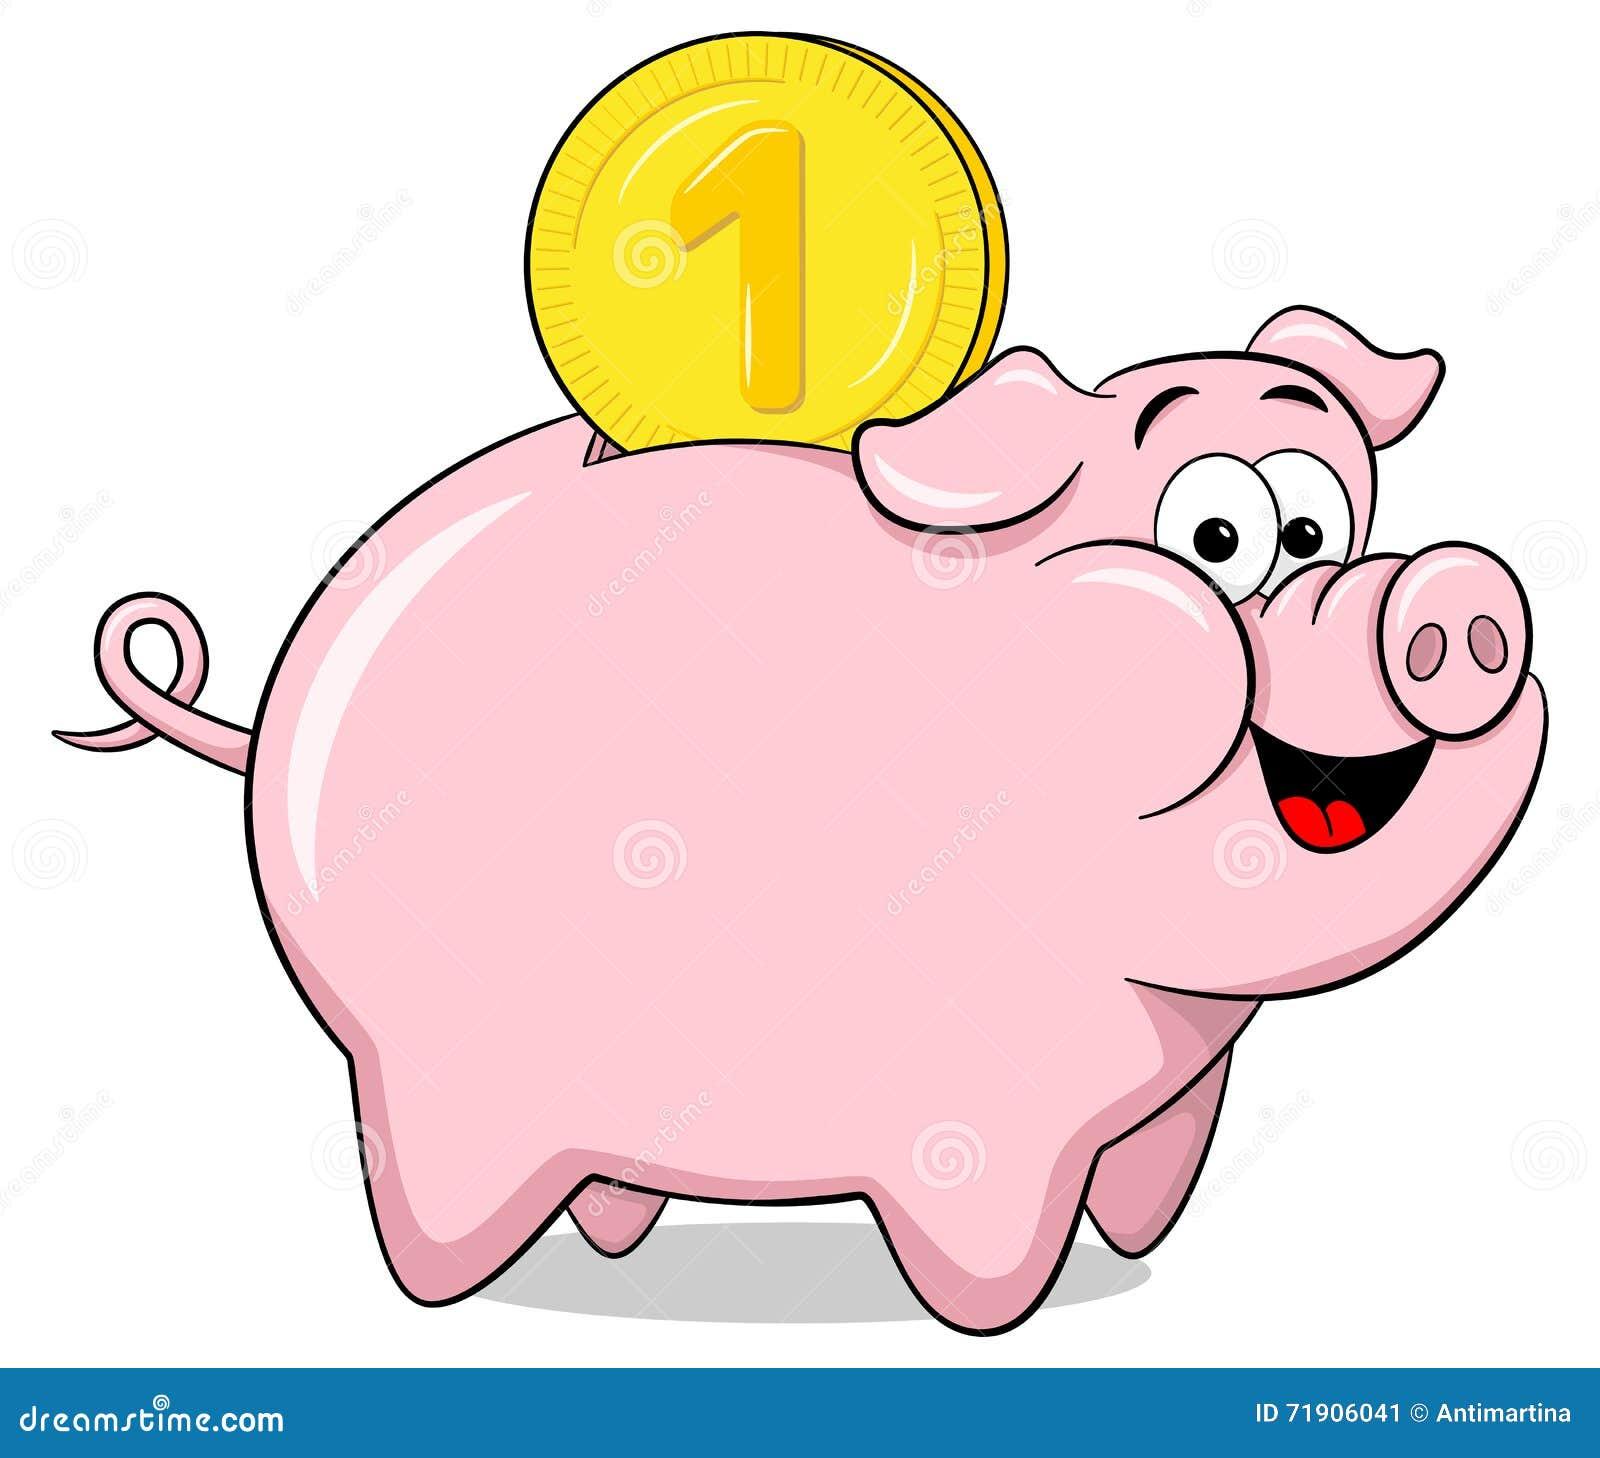 Cartoon Piggy Banks Eating Money Cartoon Vector